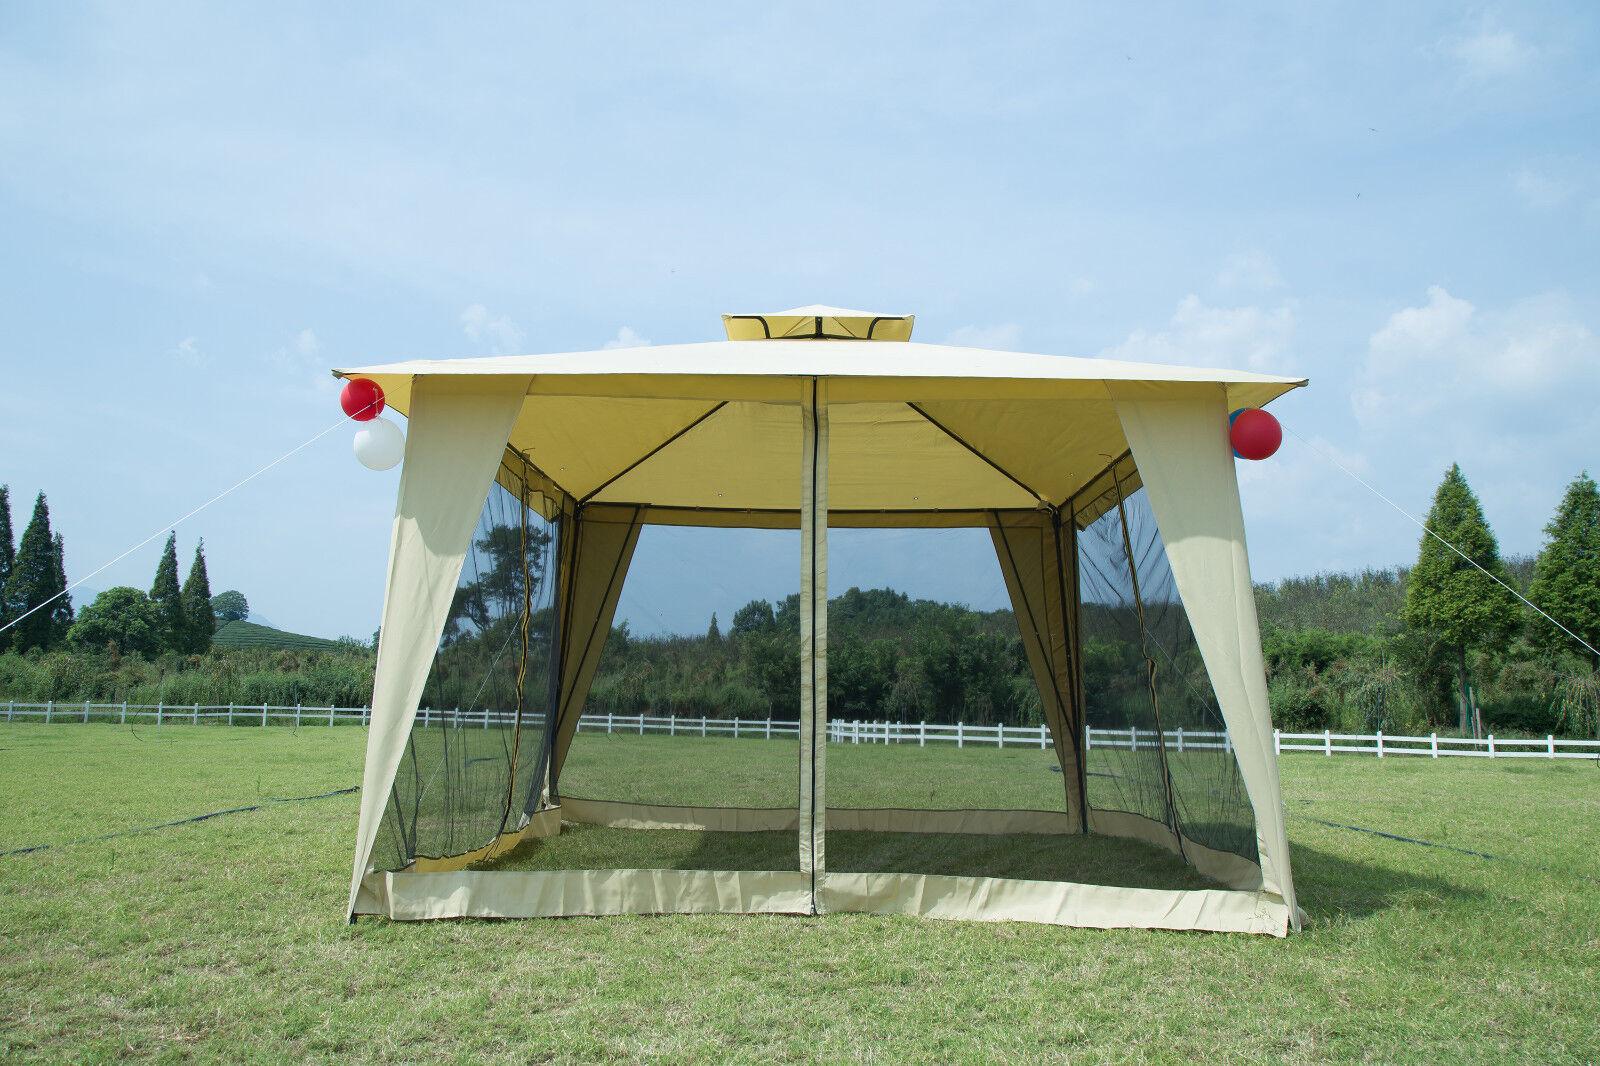 Outdoor Patio Metal Gazebo 12x12 Party Tent Garden 2-tier Ya